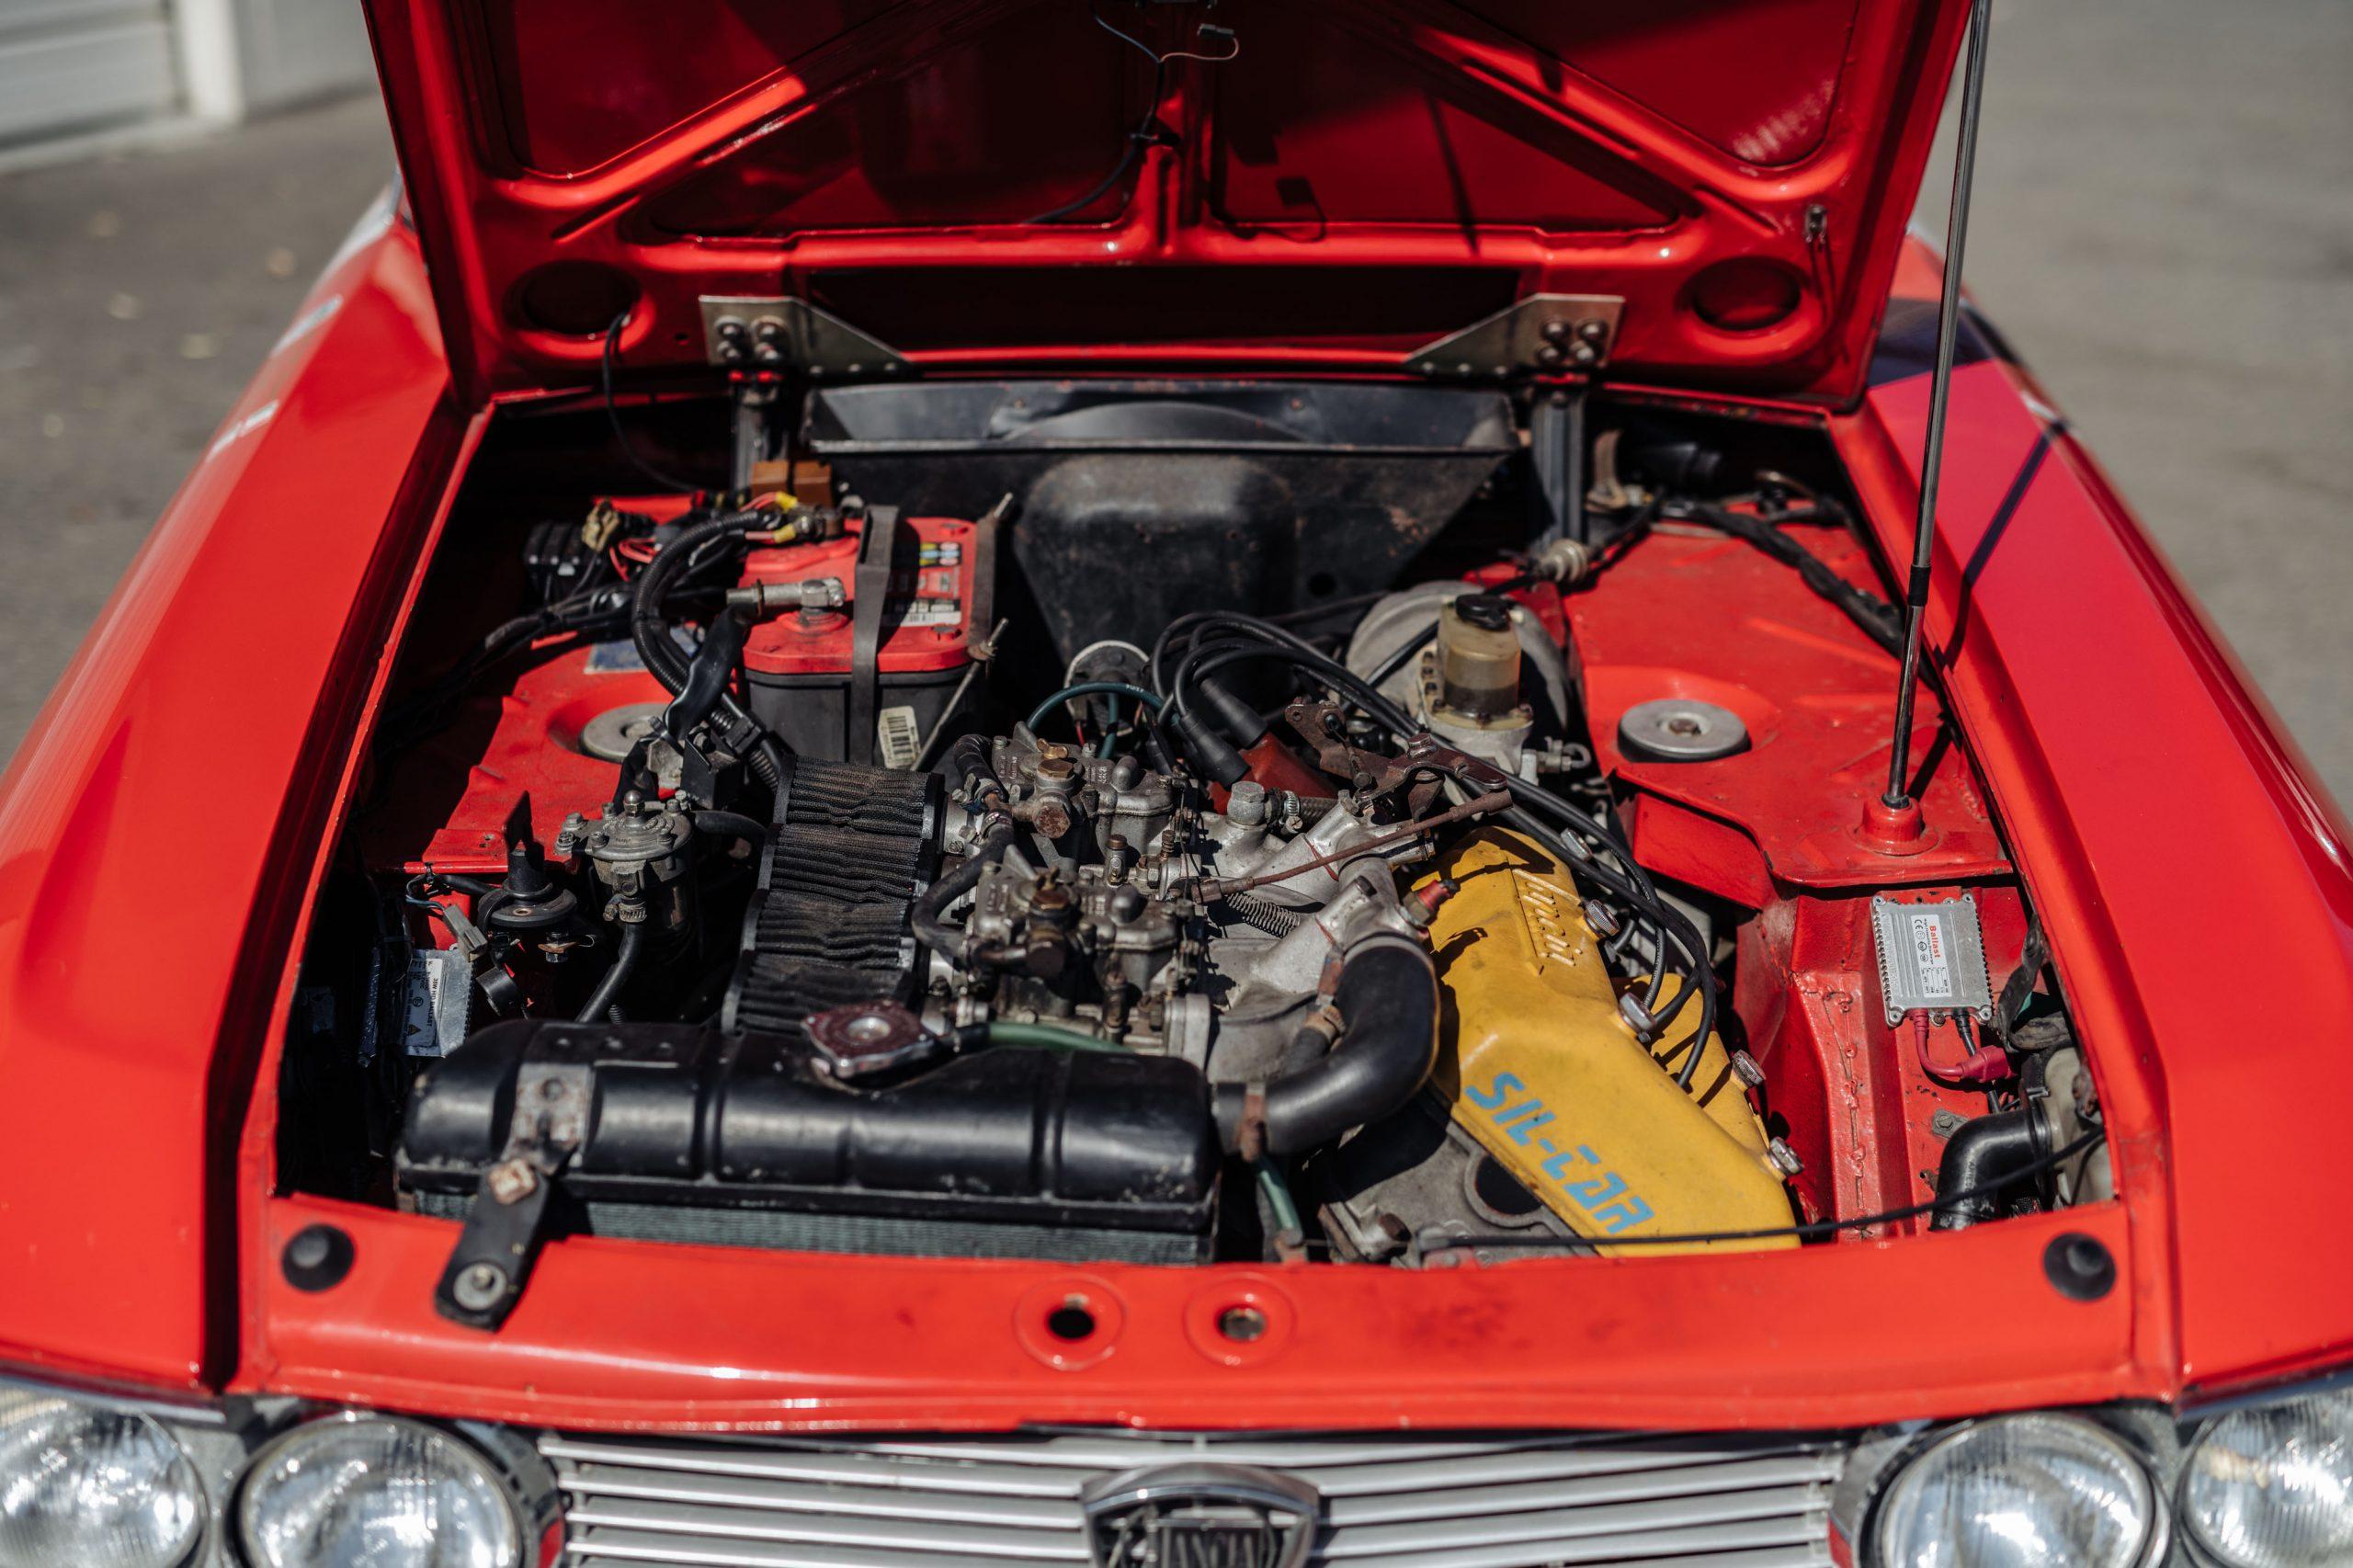 1972 Lancia Fulvia Coupé 1600 HF Series 2 'Fanalino'